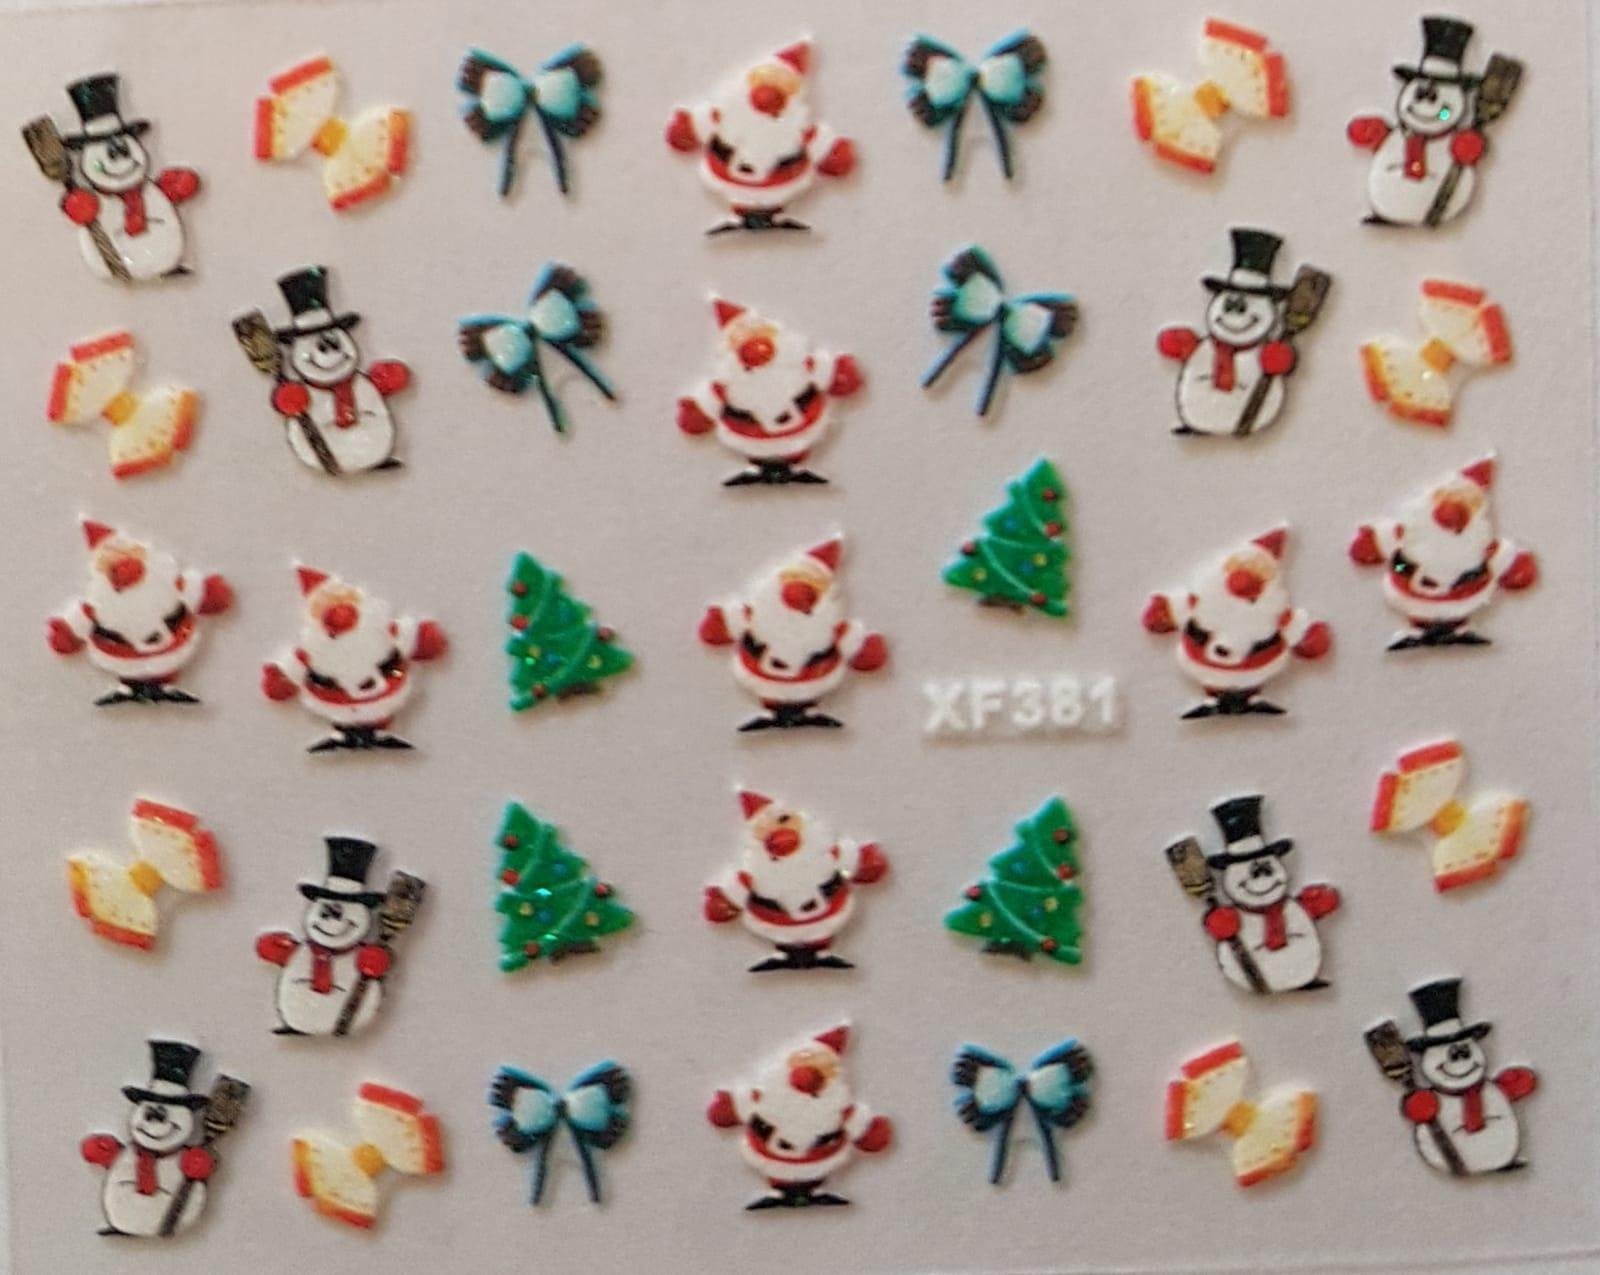 Stickers navideños xf-381